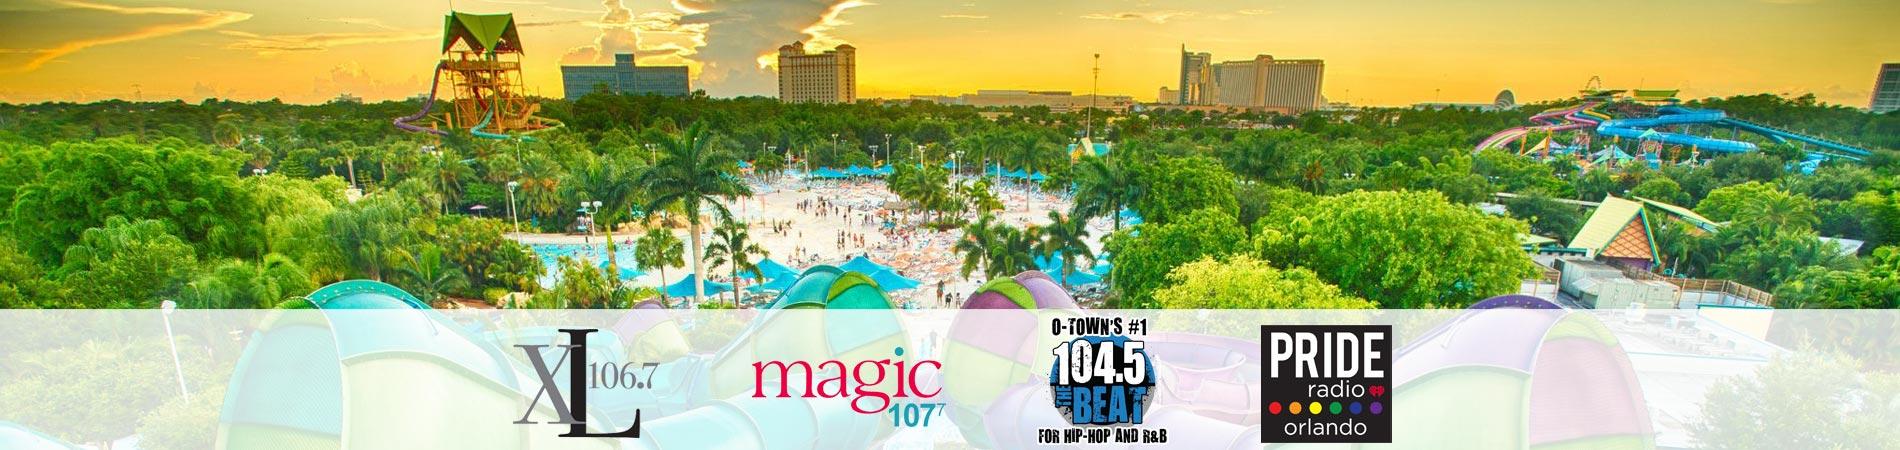 Summer Splash event with iHeart Radio at Aquatica Orlando